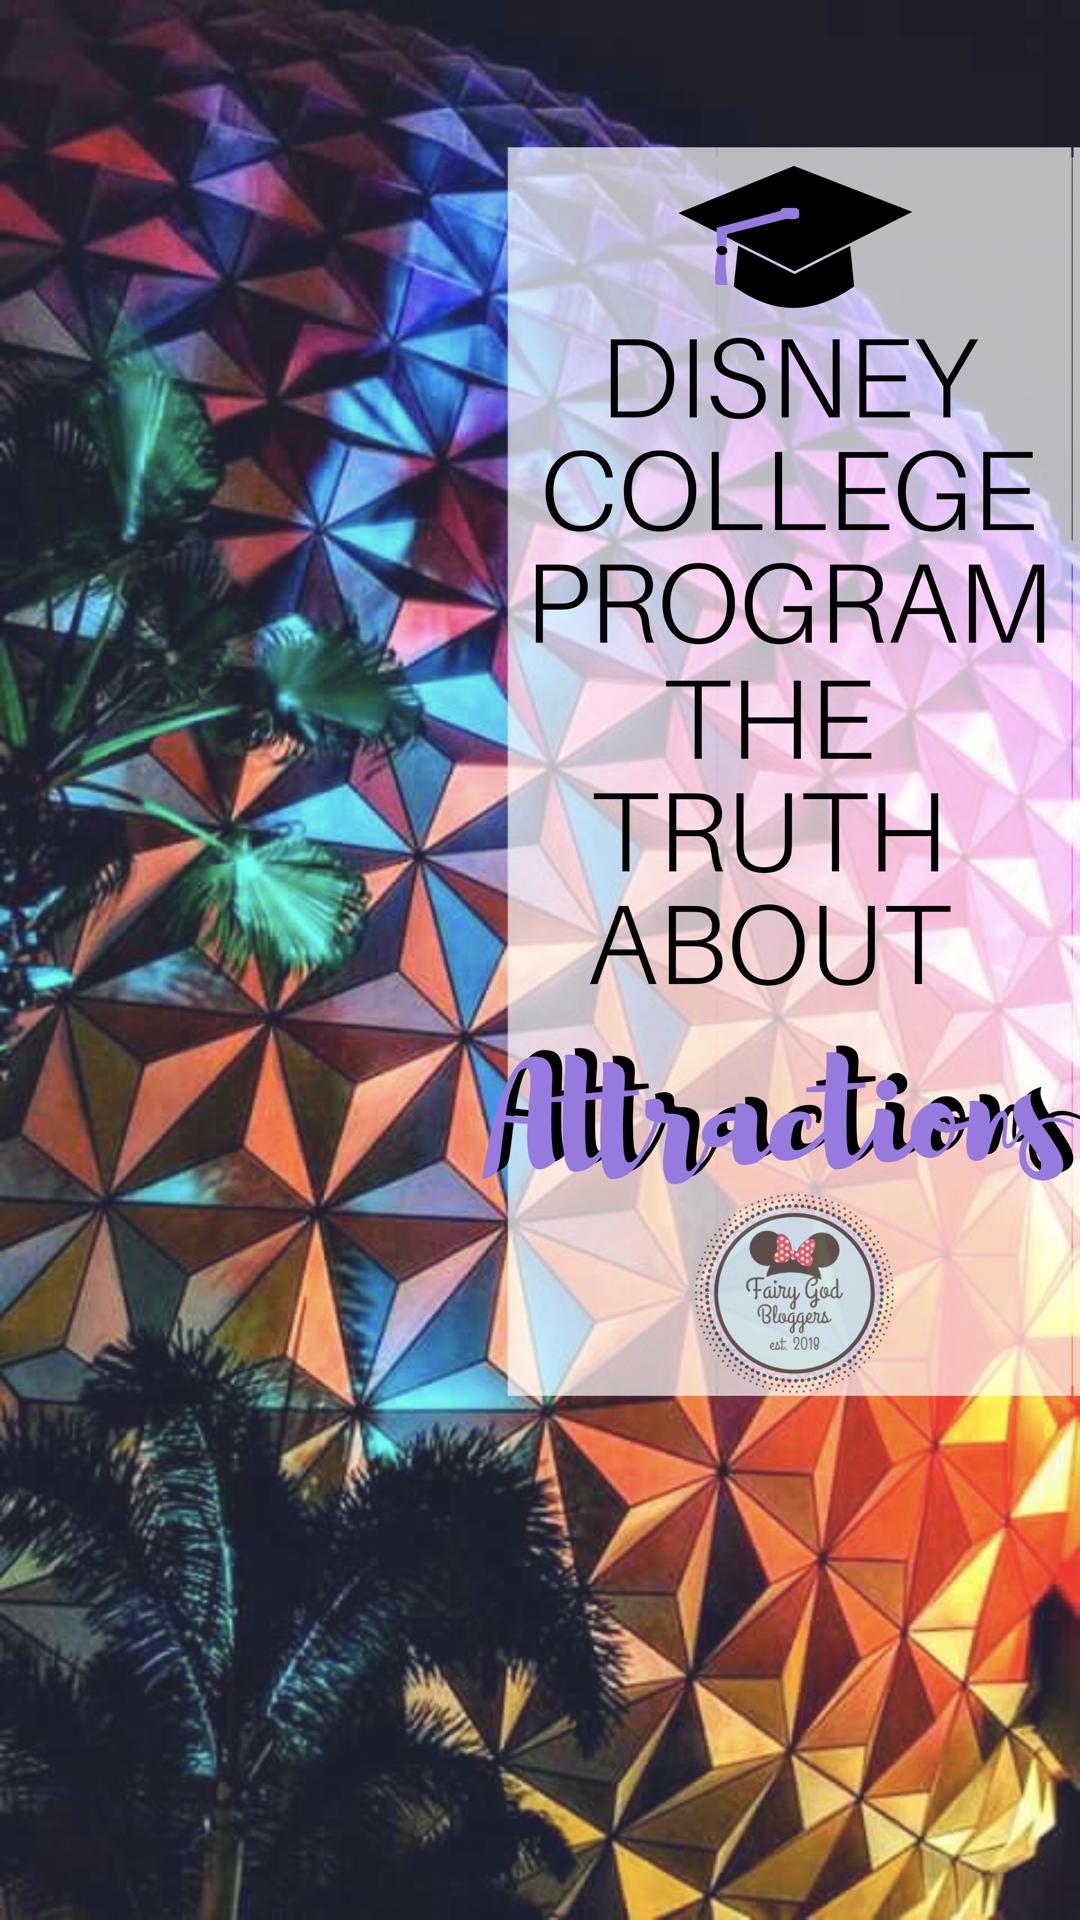 49e5ee393c0a5d153d0749c78e2cc9da - Disney College Program Spring 2018 Application